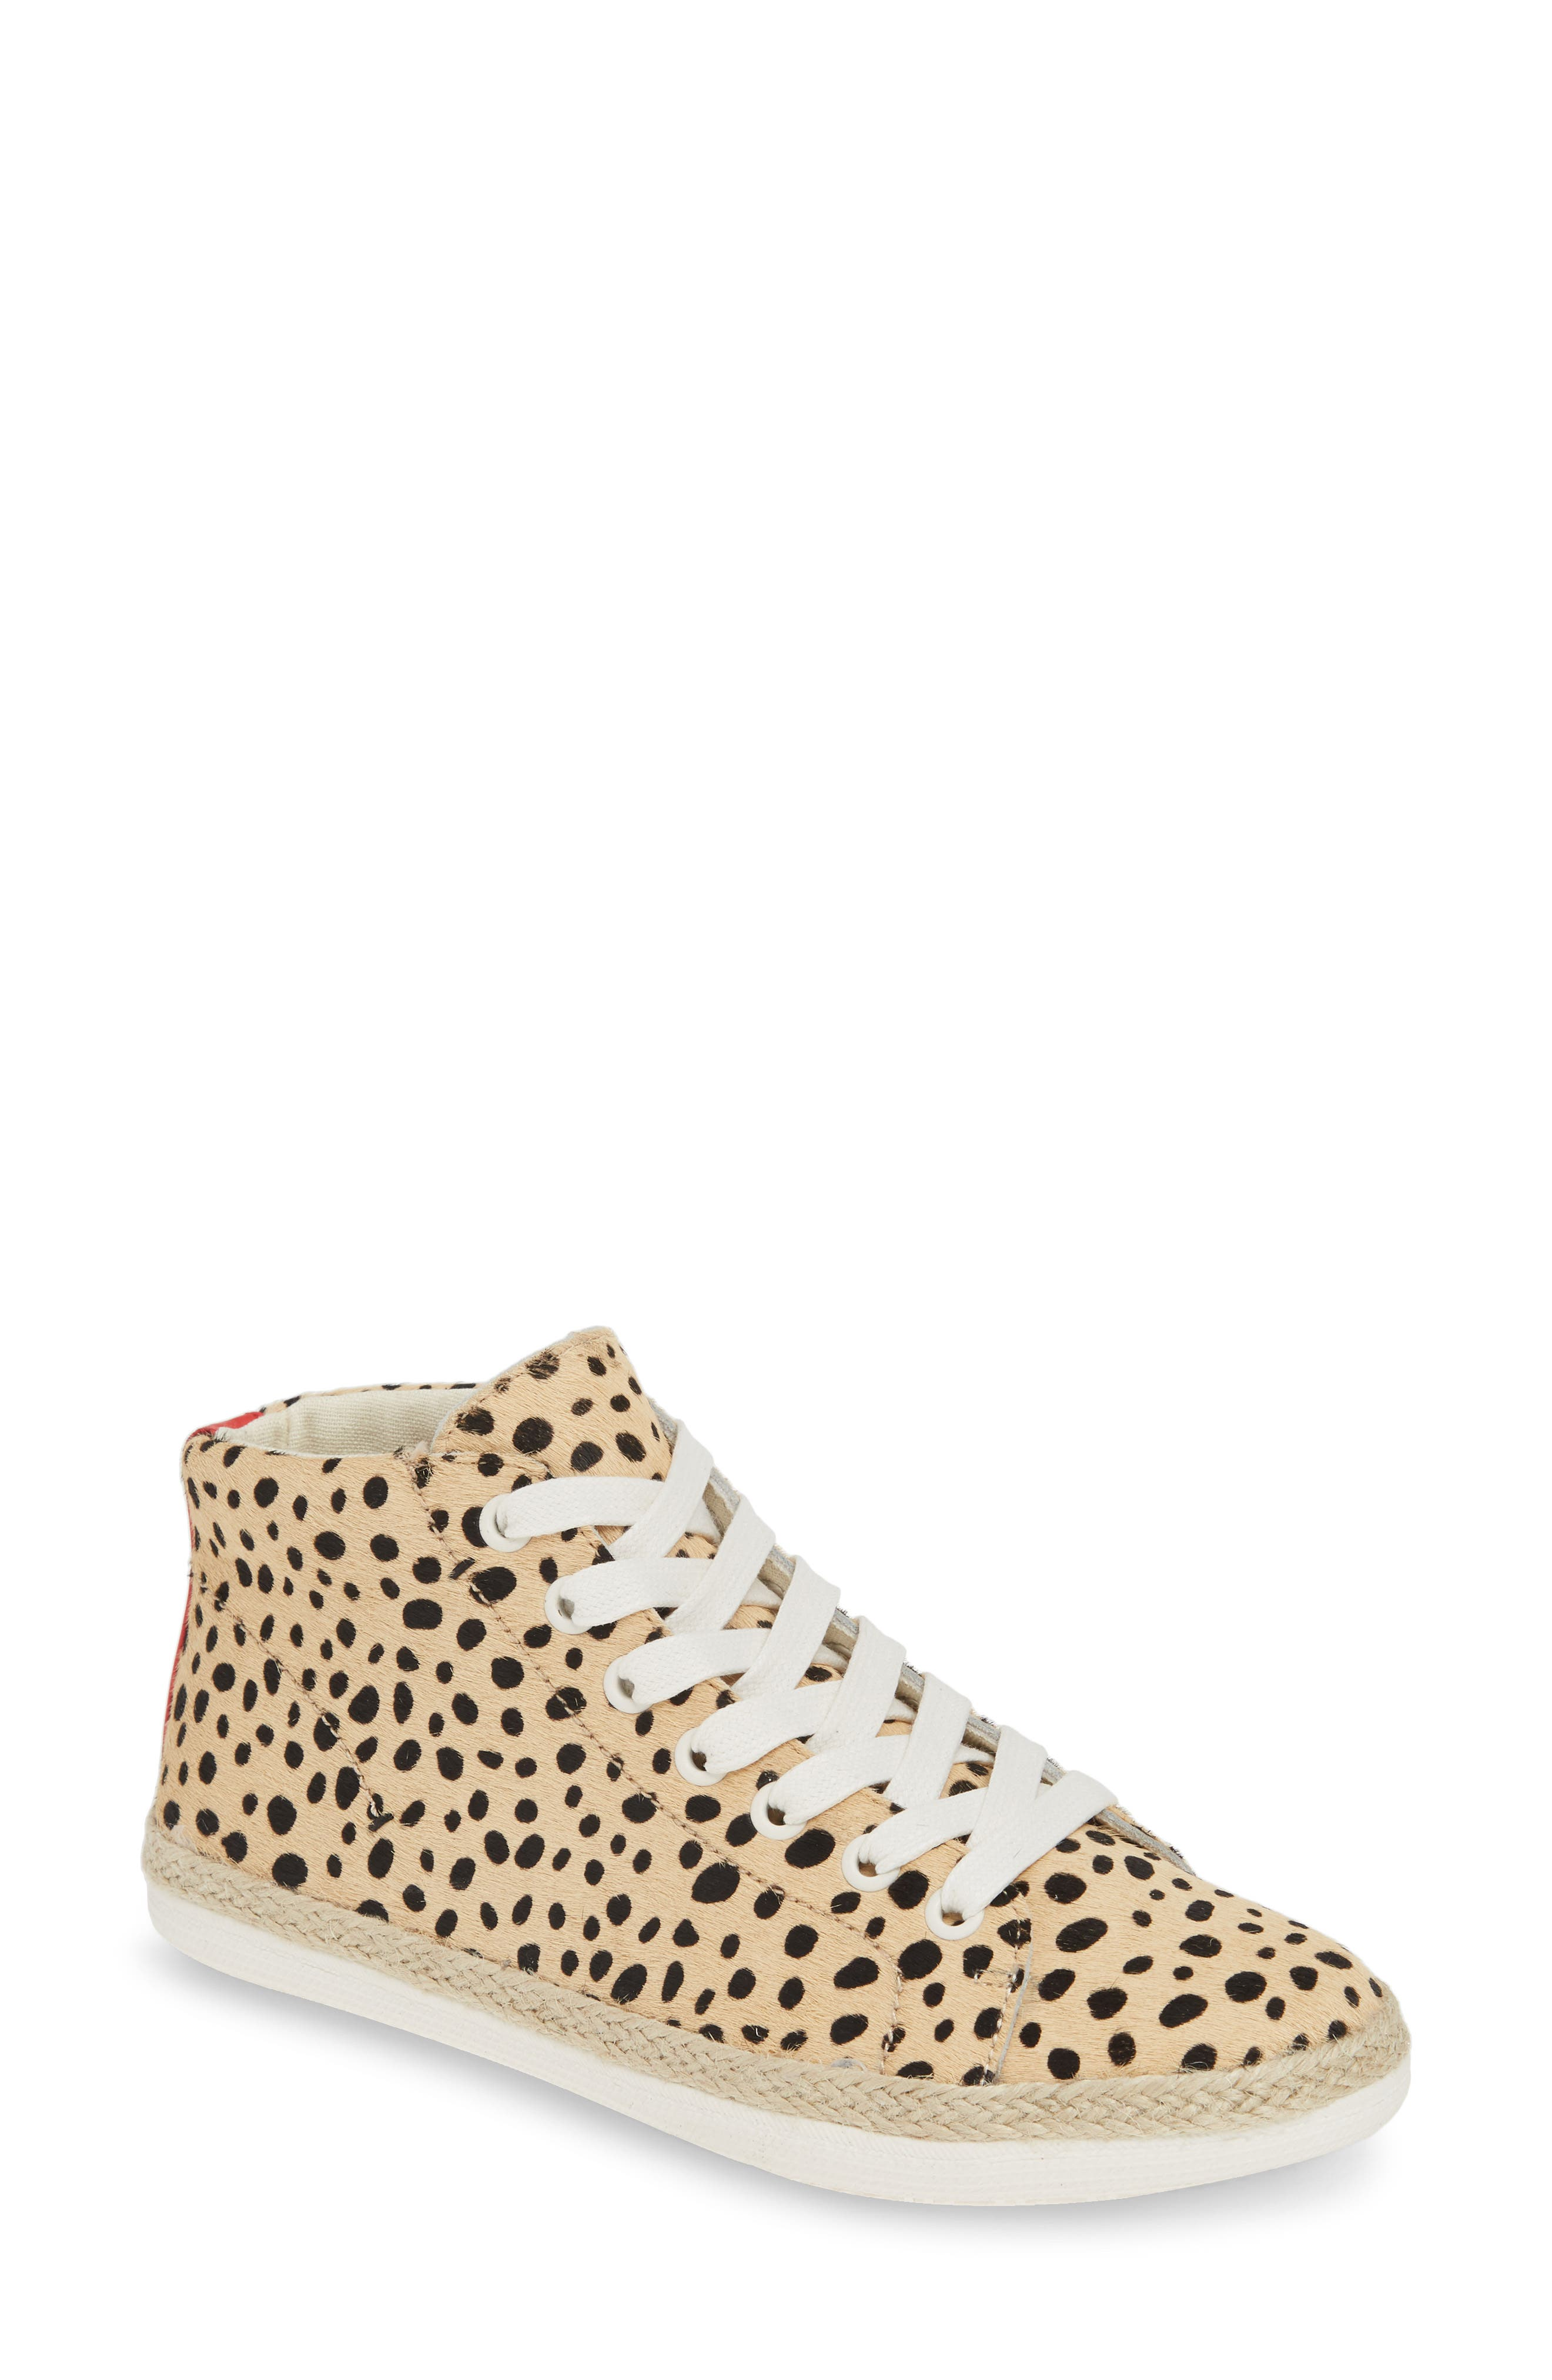 Dolce Vita Akello Espadrille High Top Sneaker, Brown